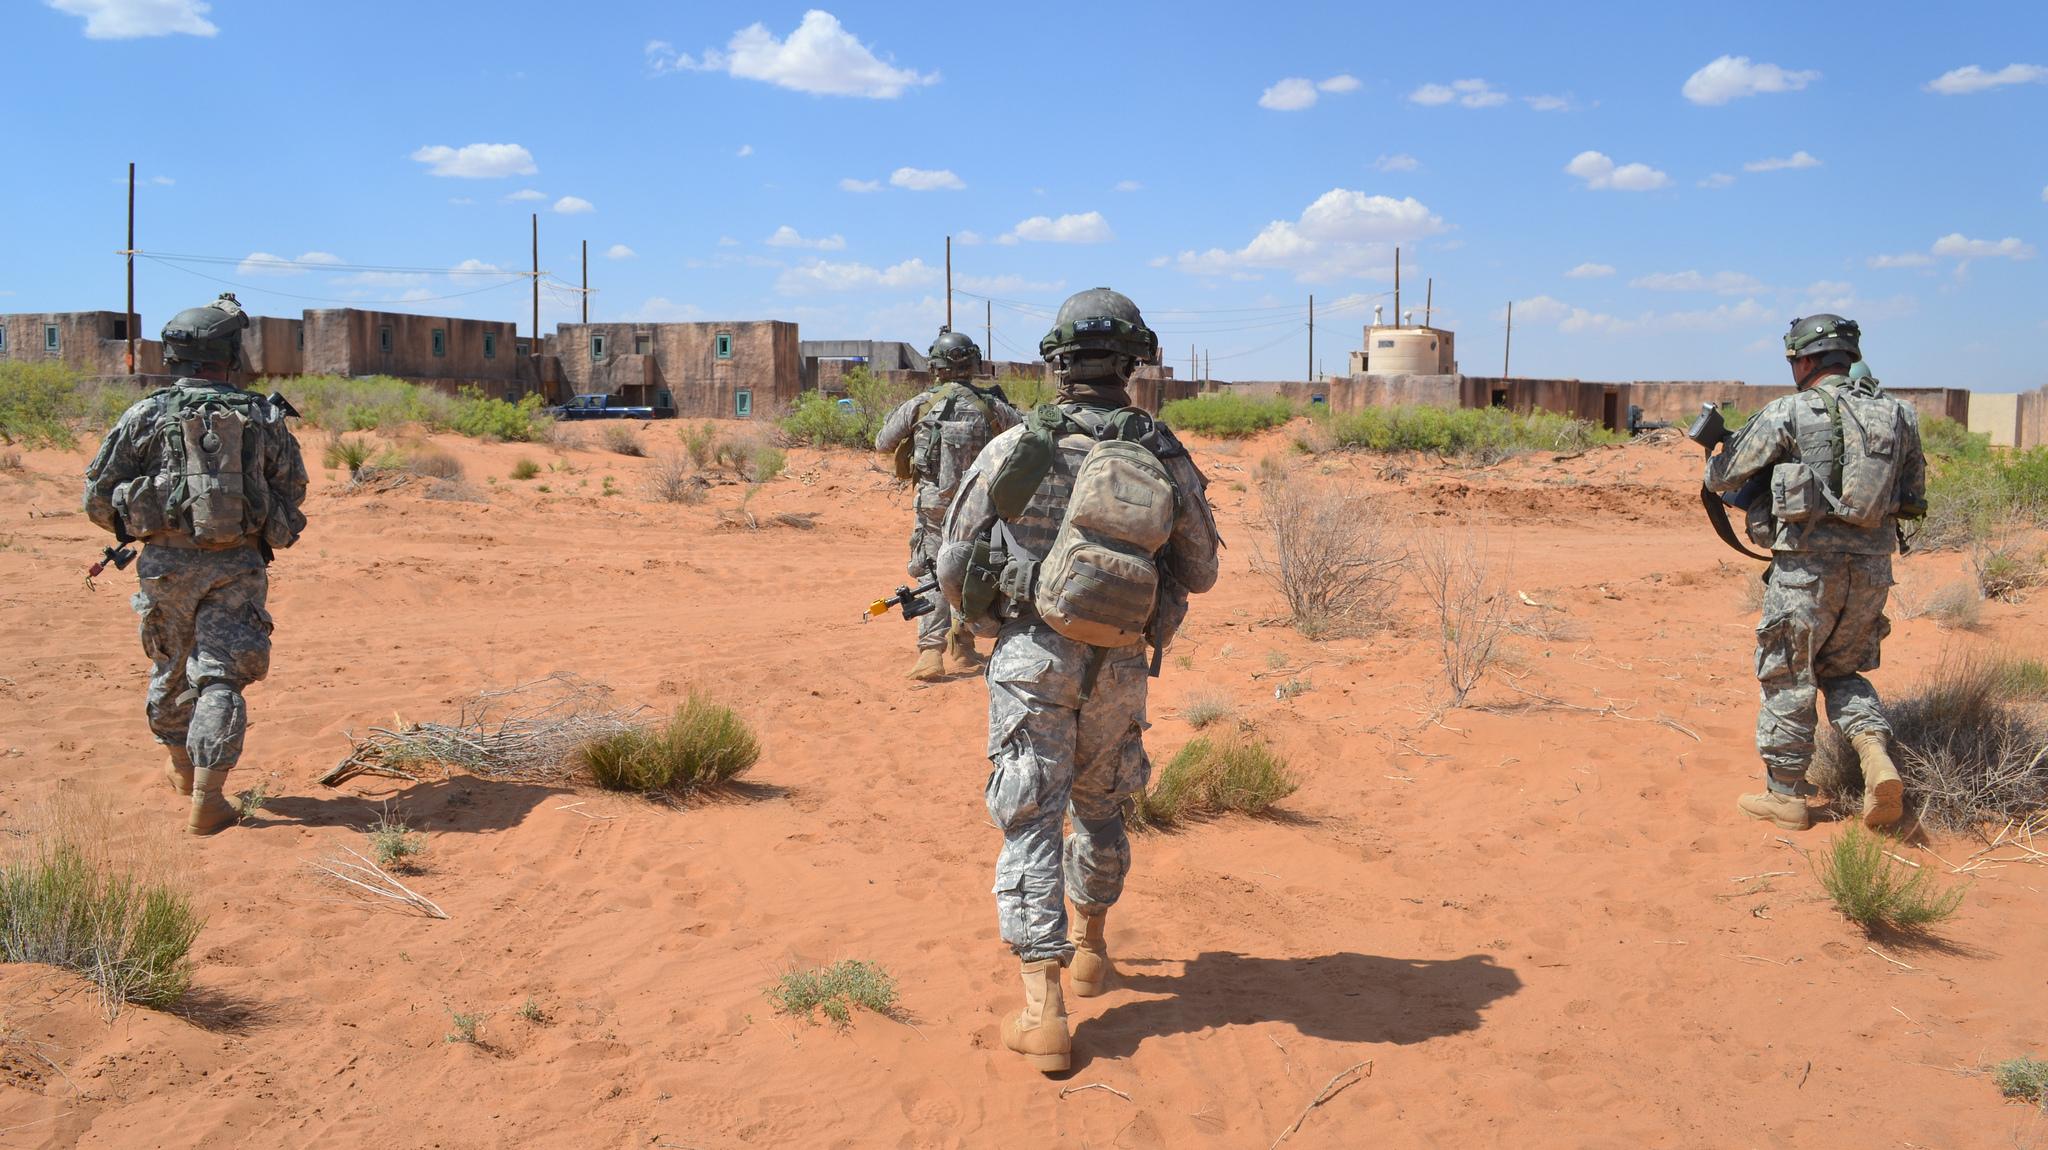 Military base near el paso tx